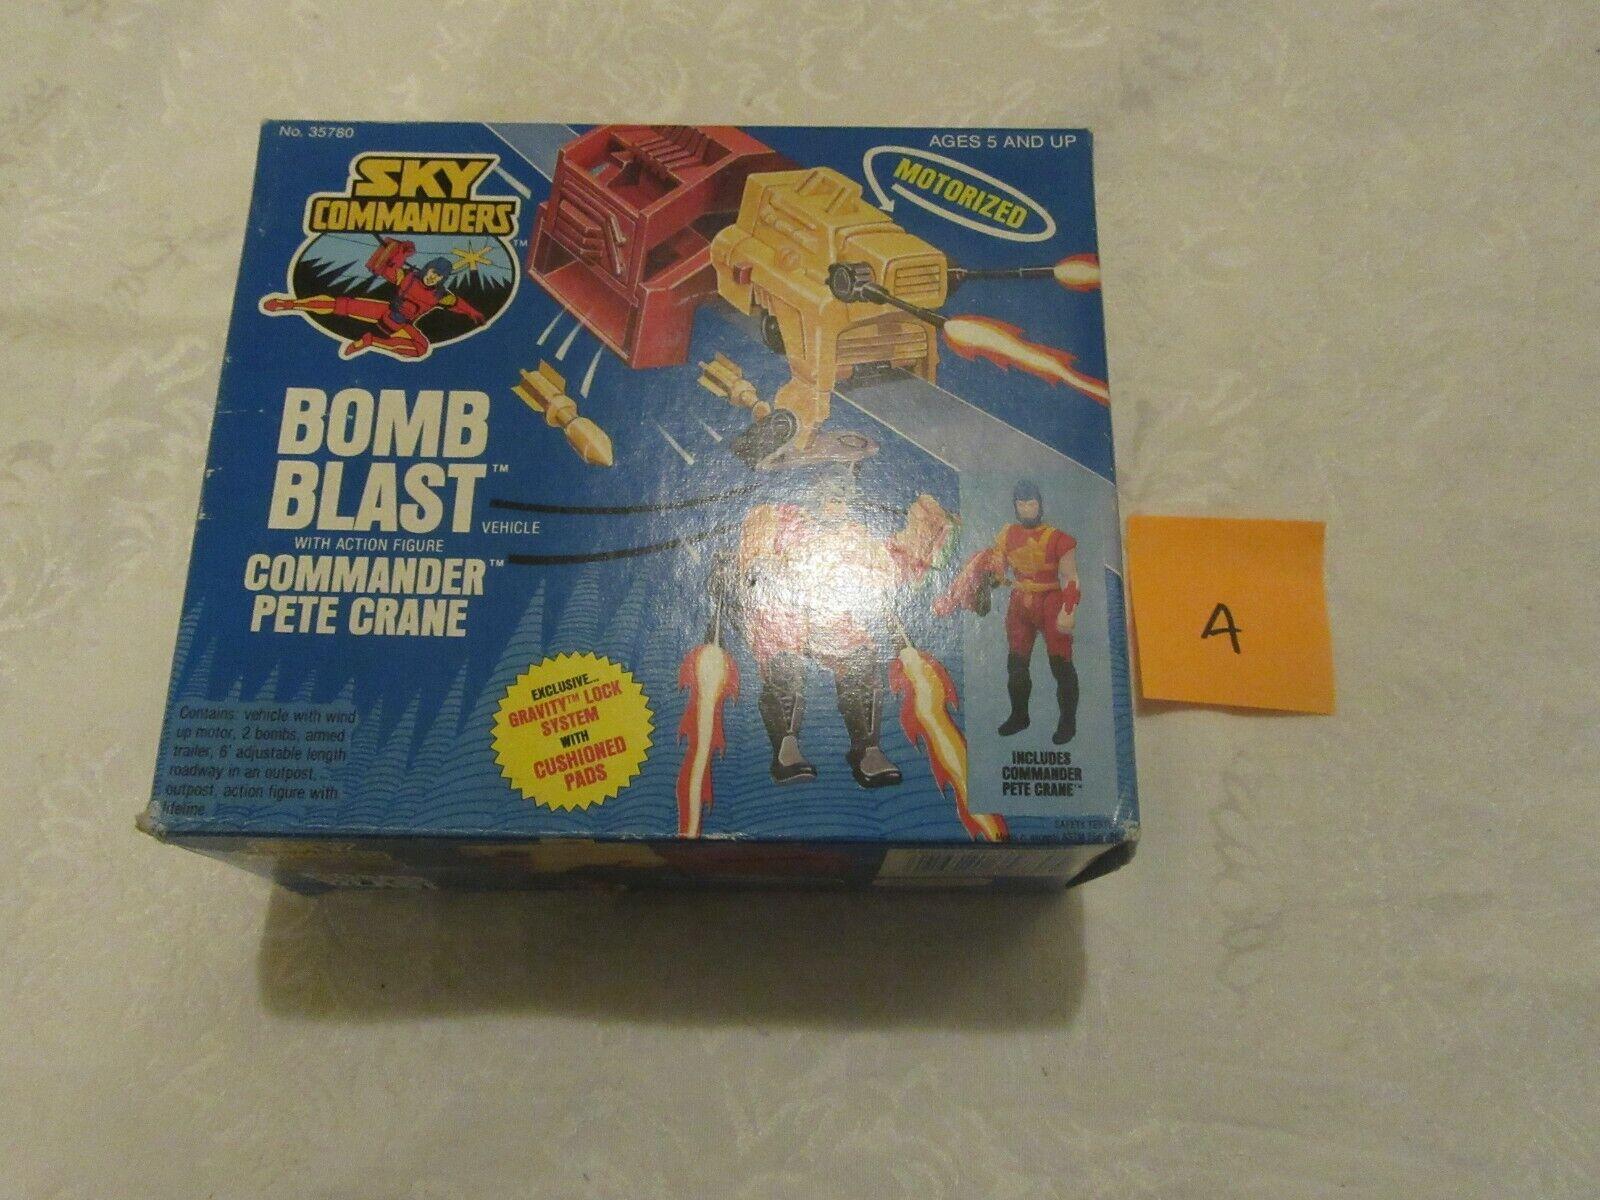 Kenner Sky Commanders Bomb Blast with Commander Pete Crane A 1987 Action Figure